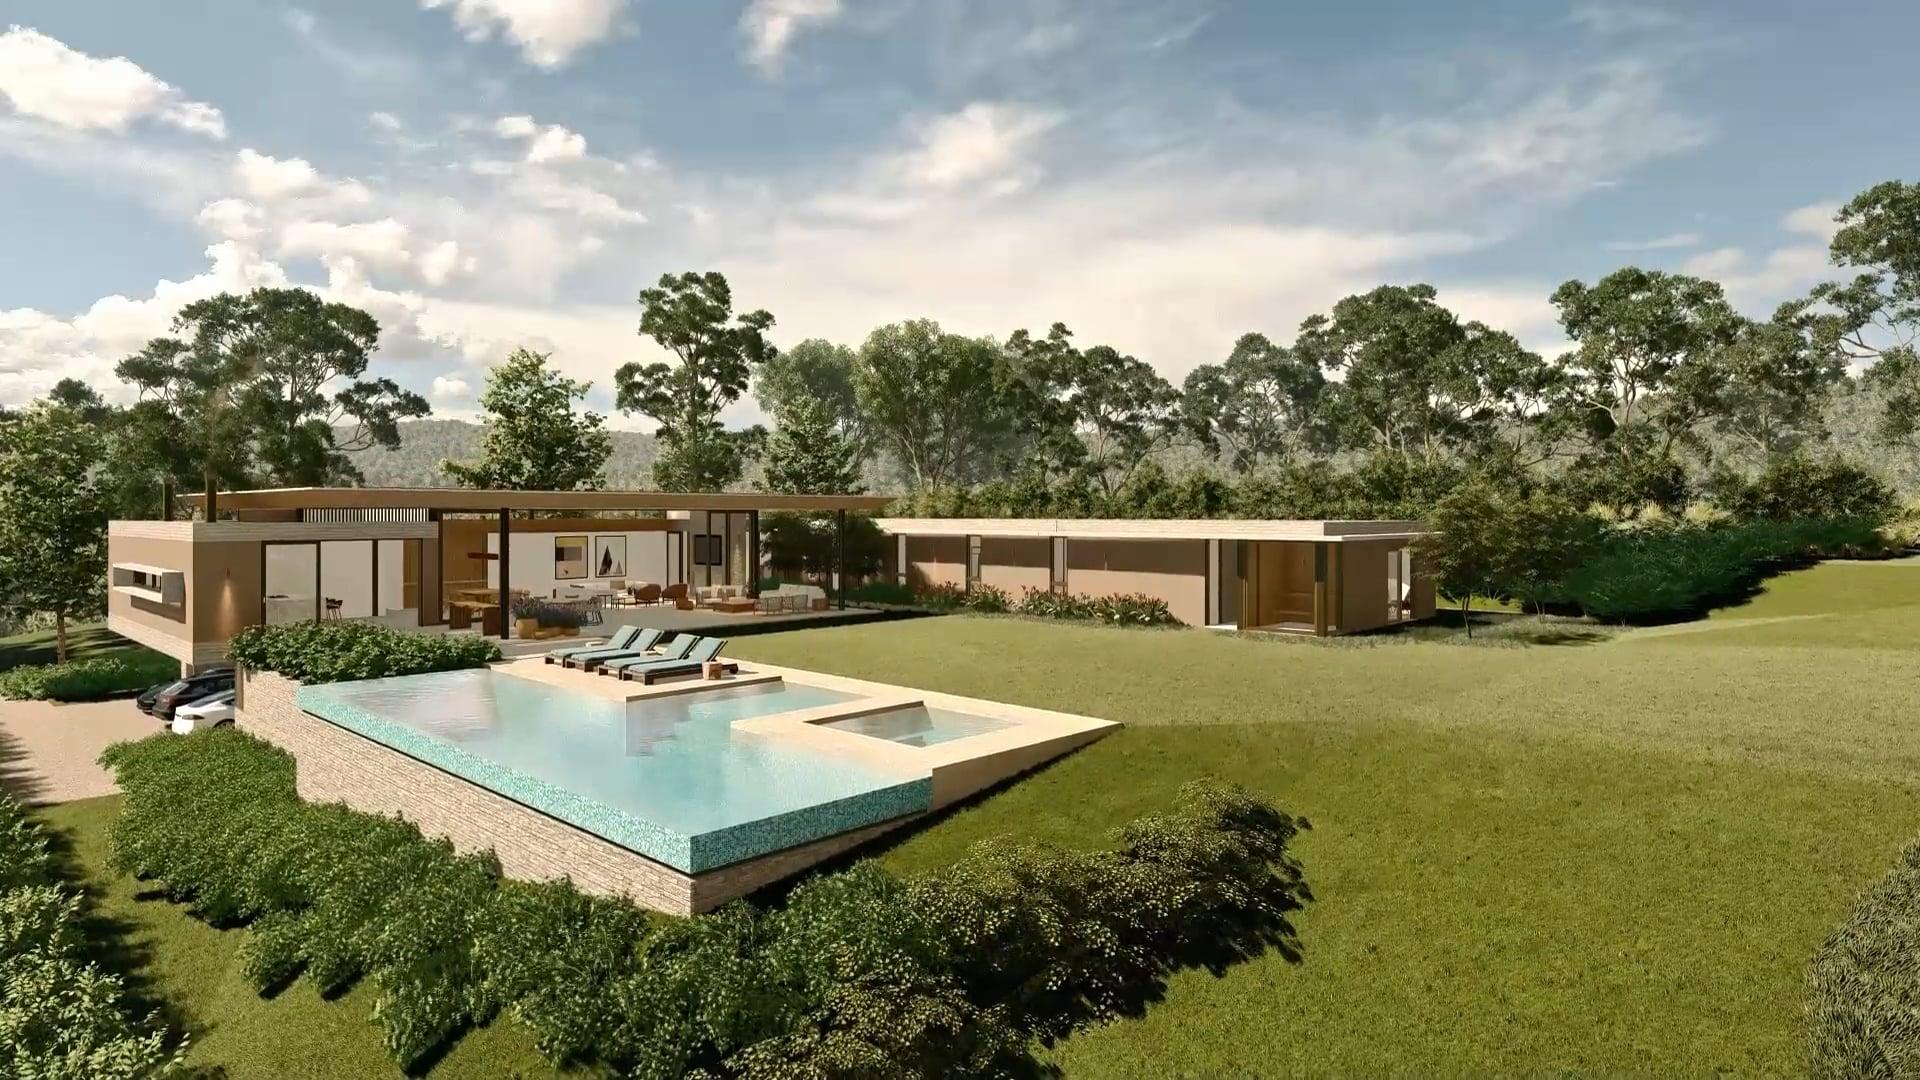 Gálvez & Márton Arquitetura + Bonavita - Quinta da Baroneza - Quadra S2 Lote 7